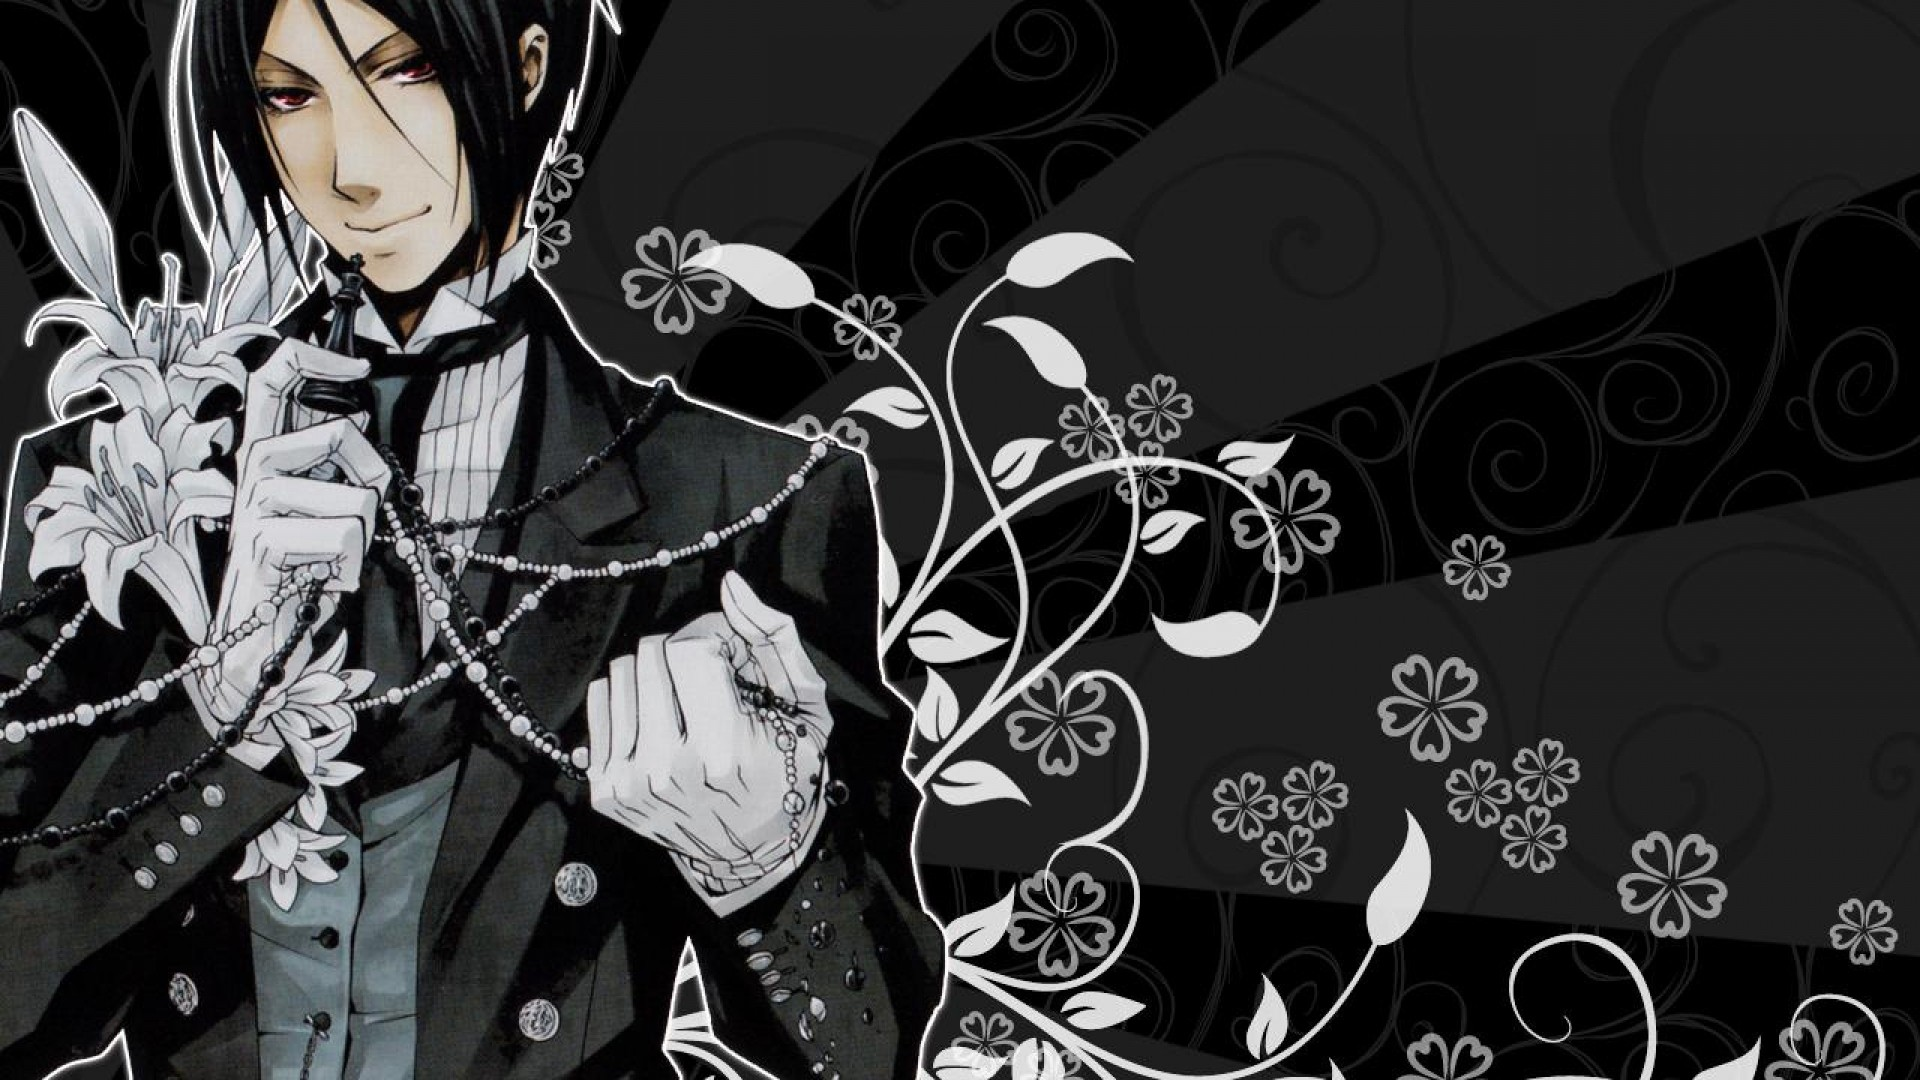 Black Butler Wallpaper and Background